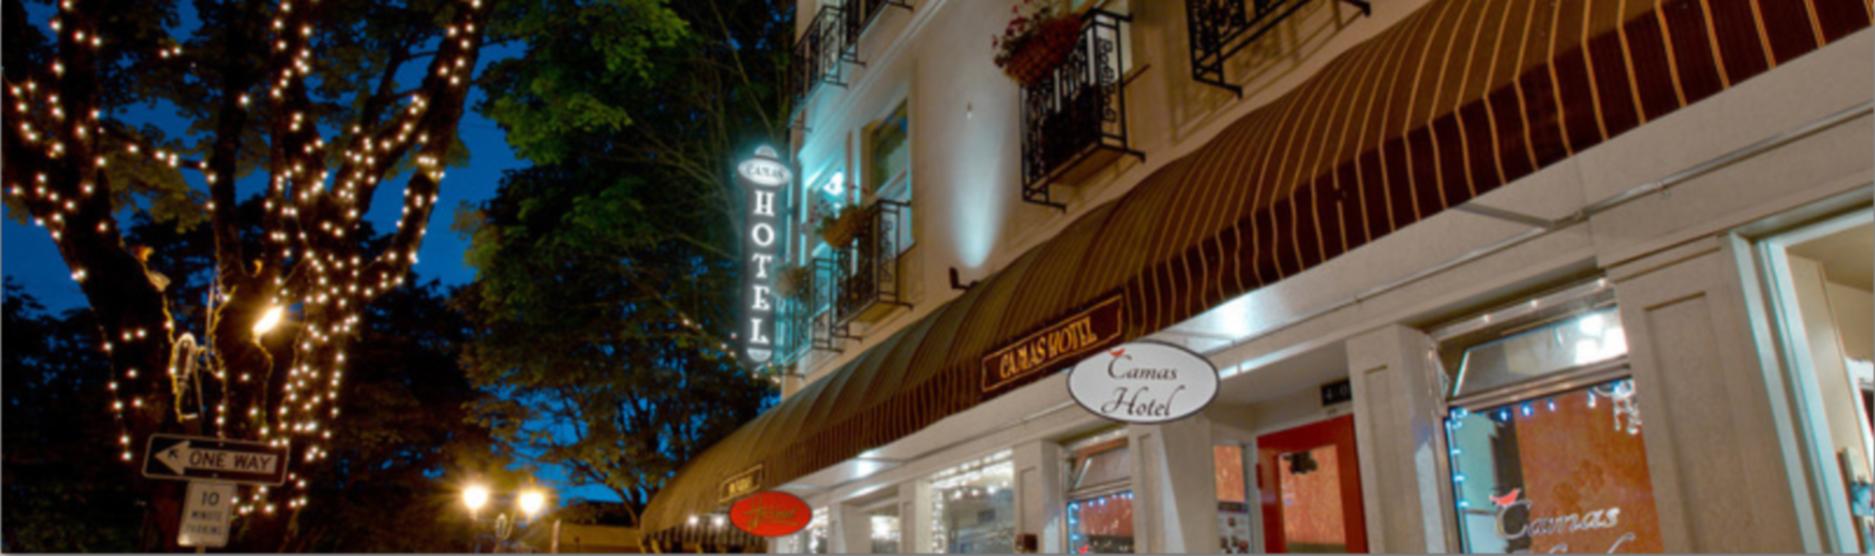 A sign above a store at Camas Hotel.